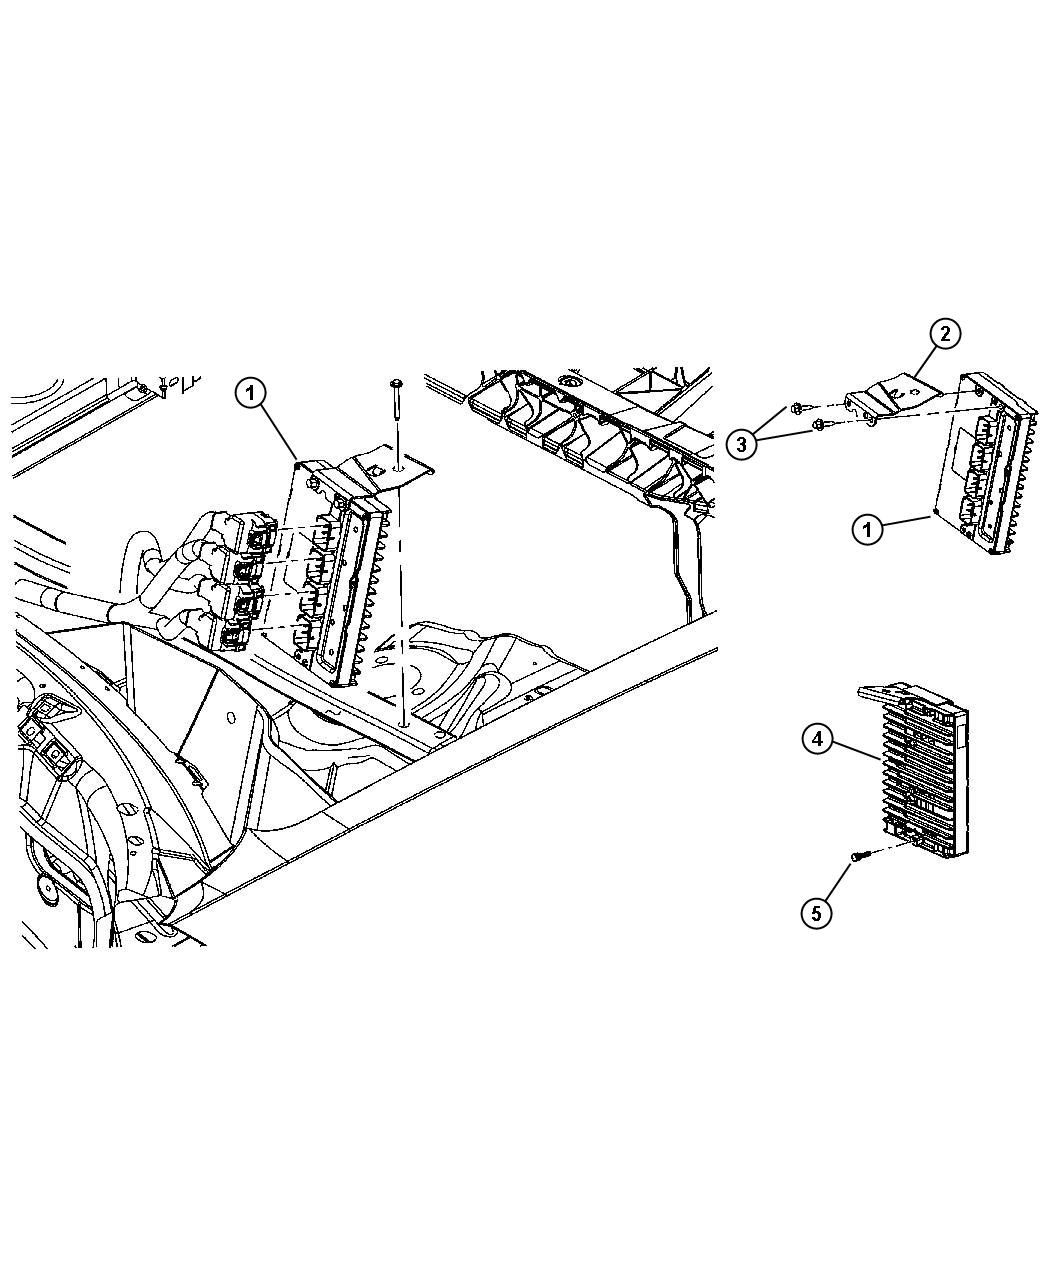 Dodge Challenger Cover. Wiring protector. Left, left side